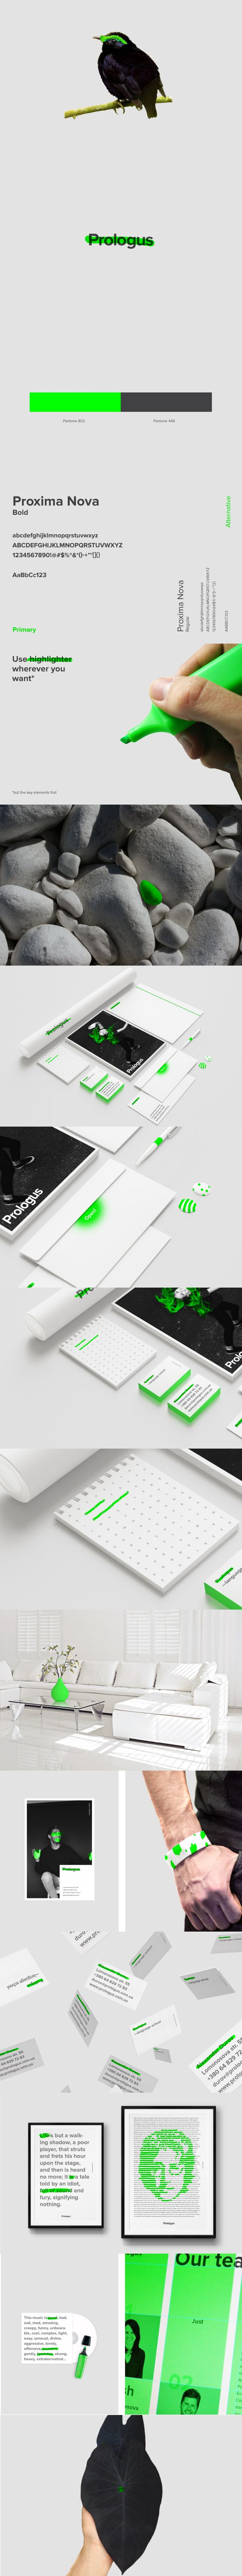 Cool Brand Identity Design on the Internet. Prologus. #branding #brandidentity #identitydesign